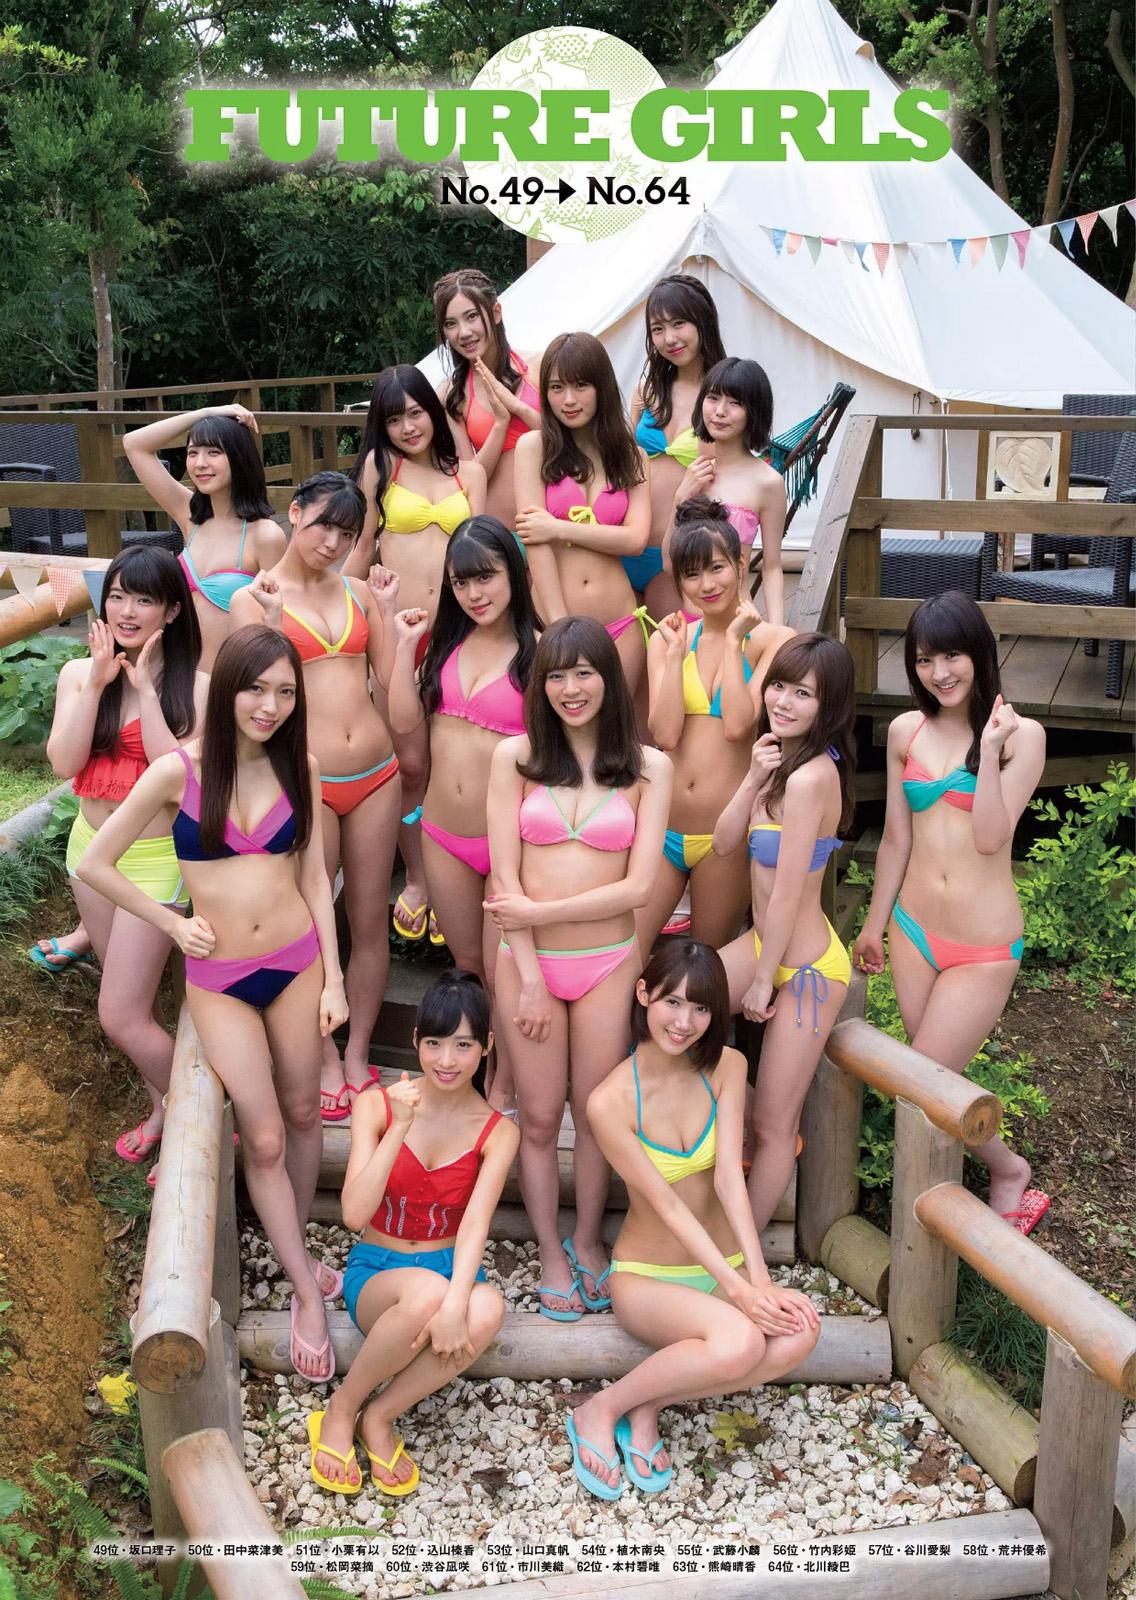 AKB48 No.02, Weekly Playboy 2017 No.33 (週刊プレイボーイ 2017年33号)